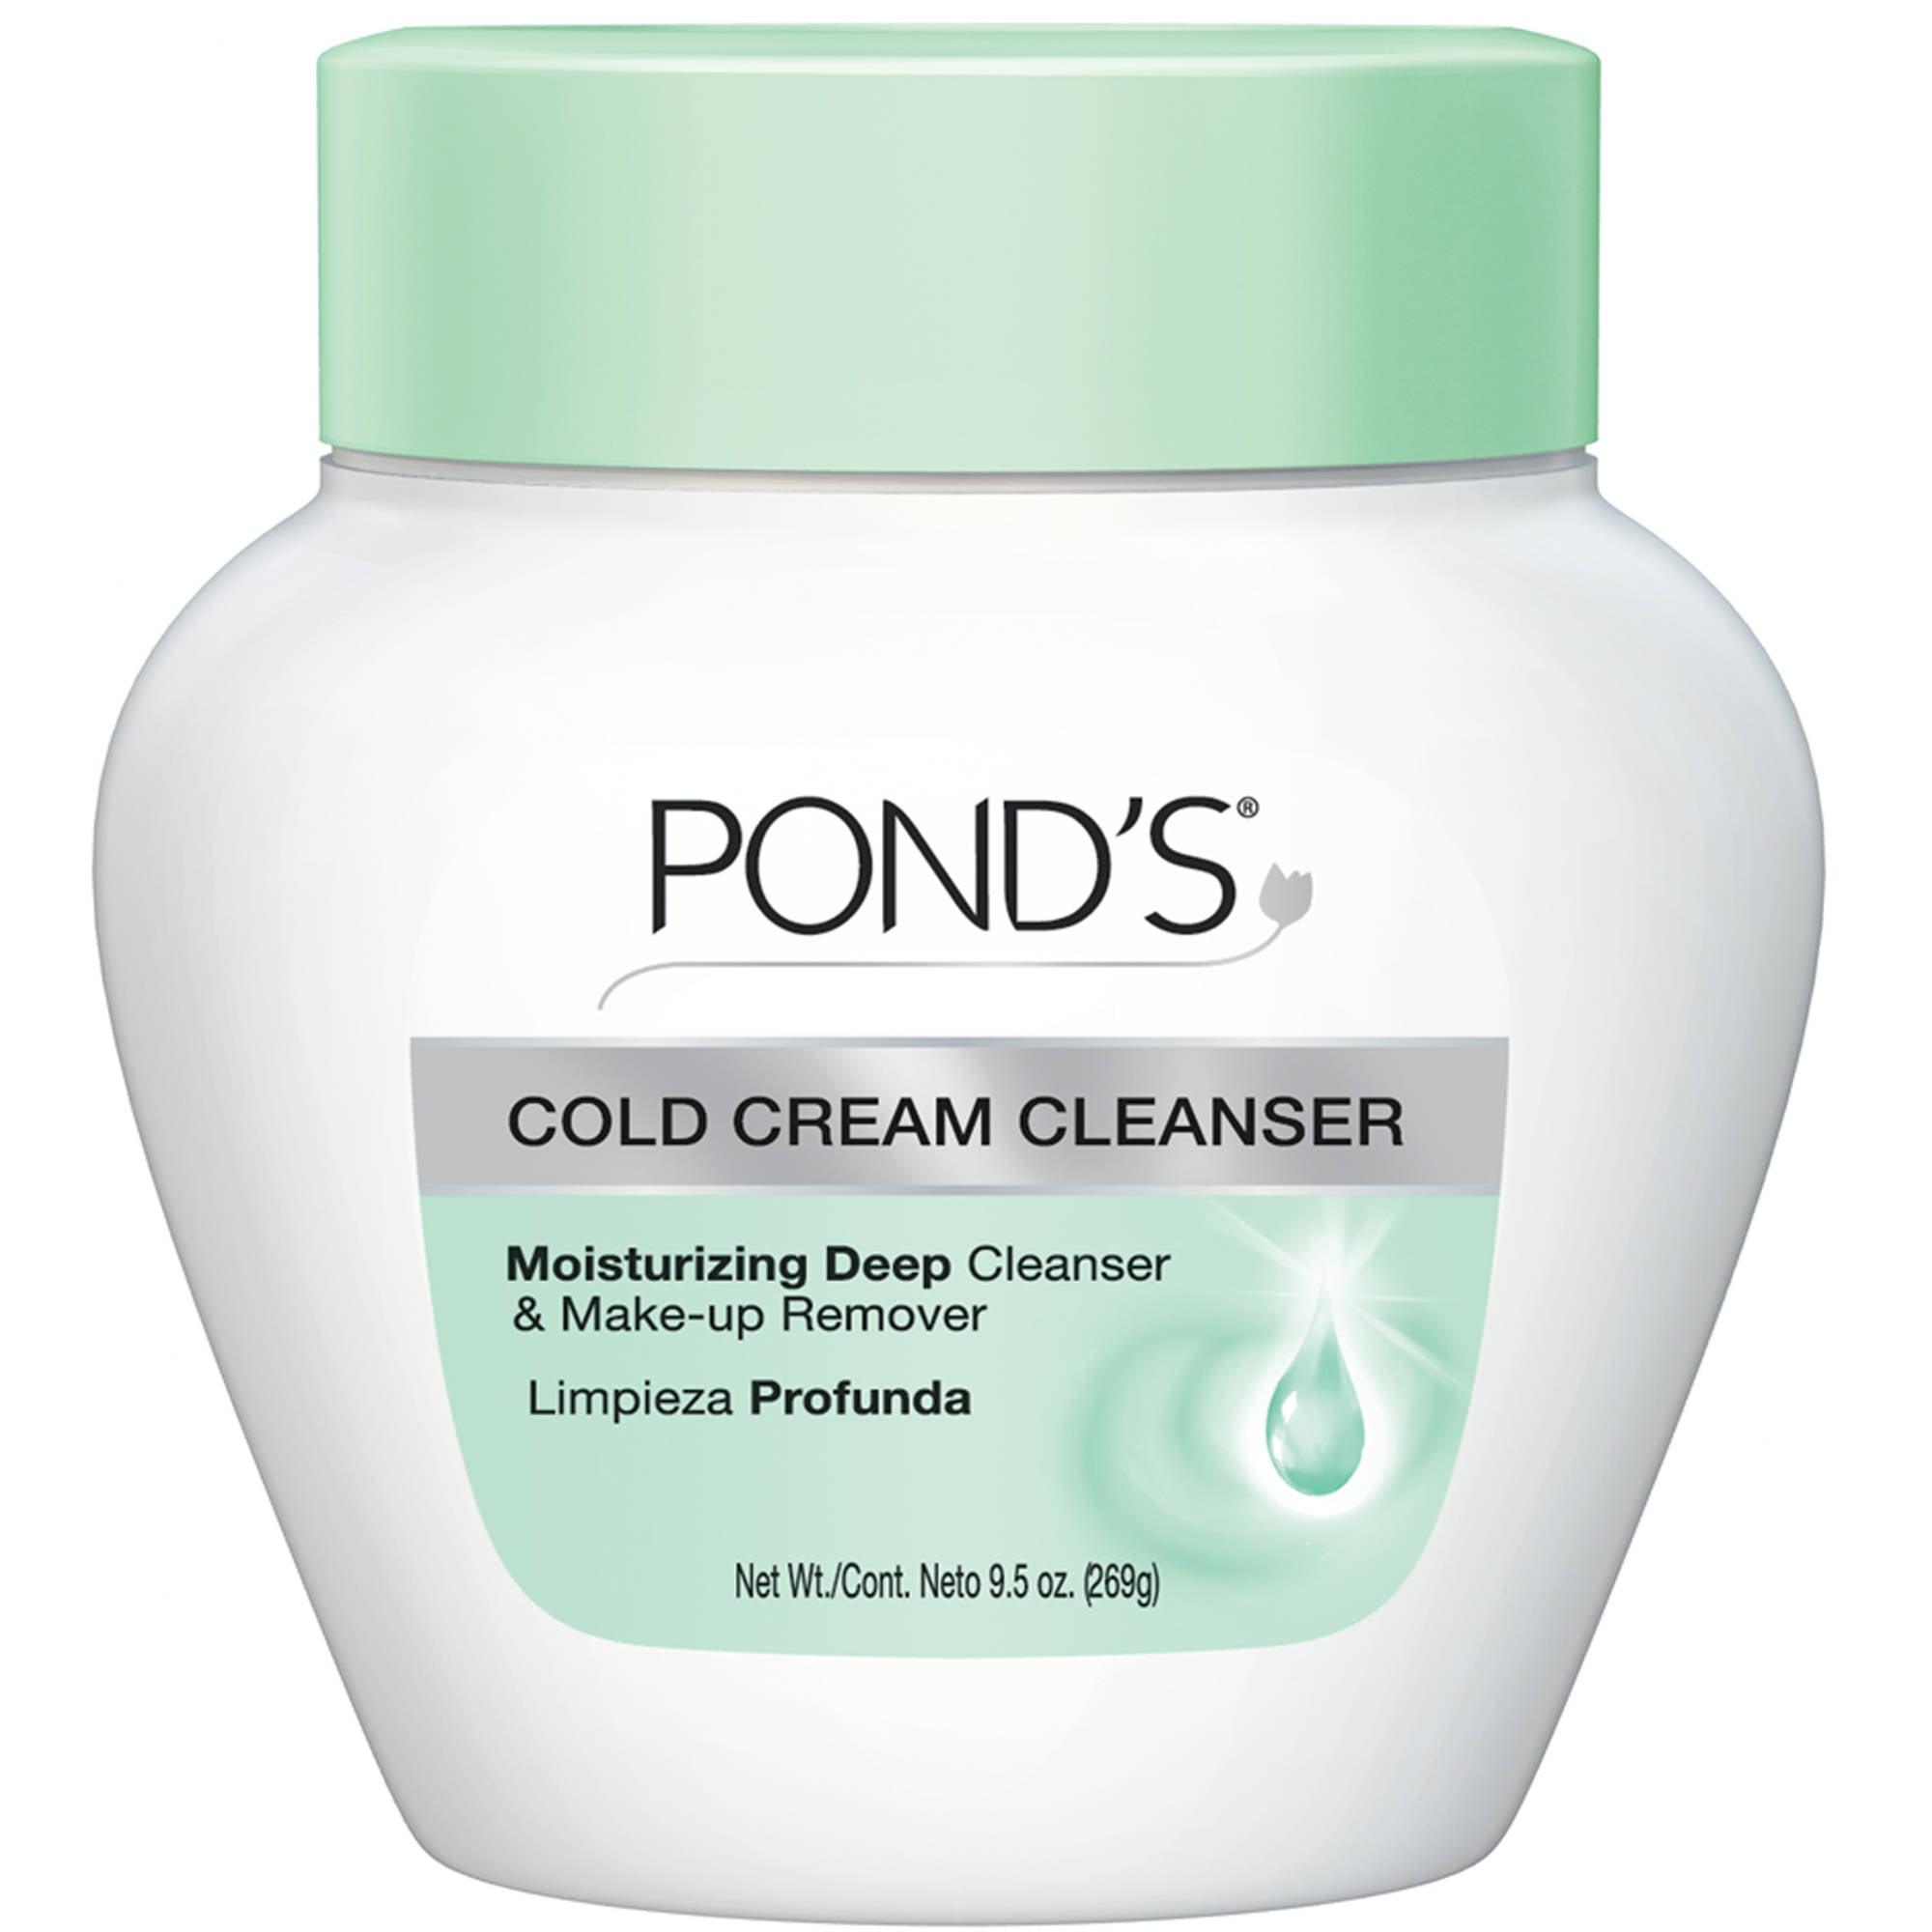 Pond's Cold Cream Cleanser, 9.5 oz